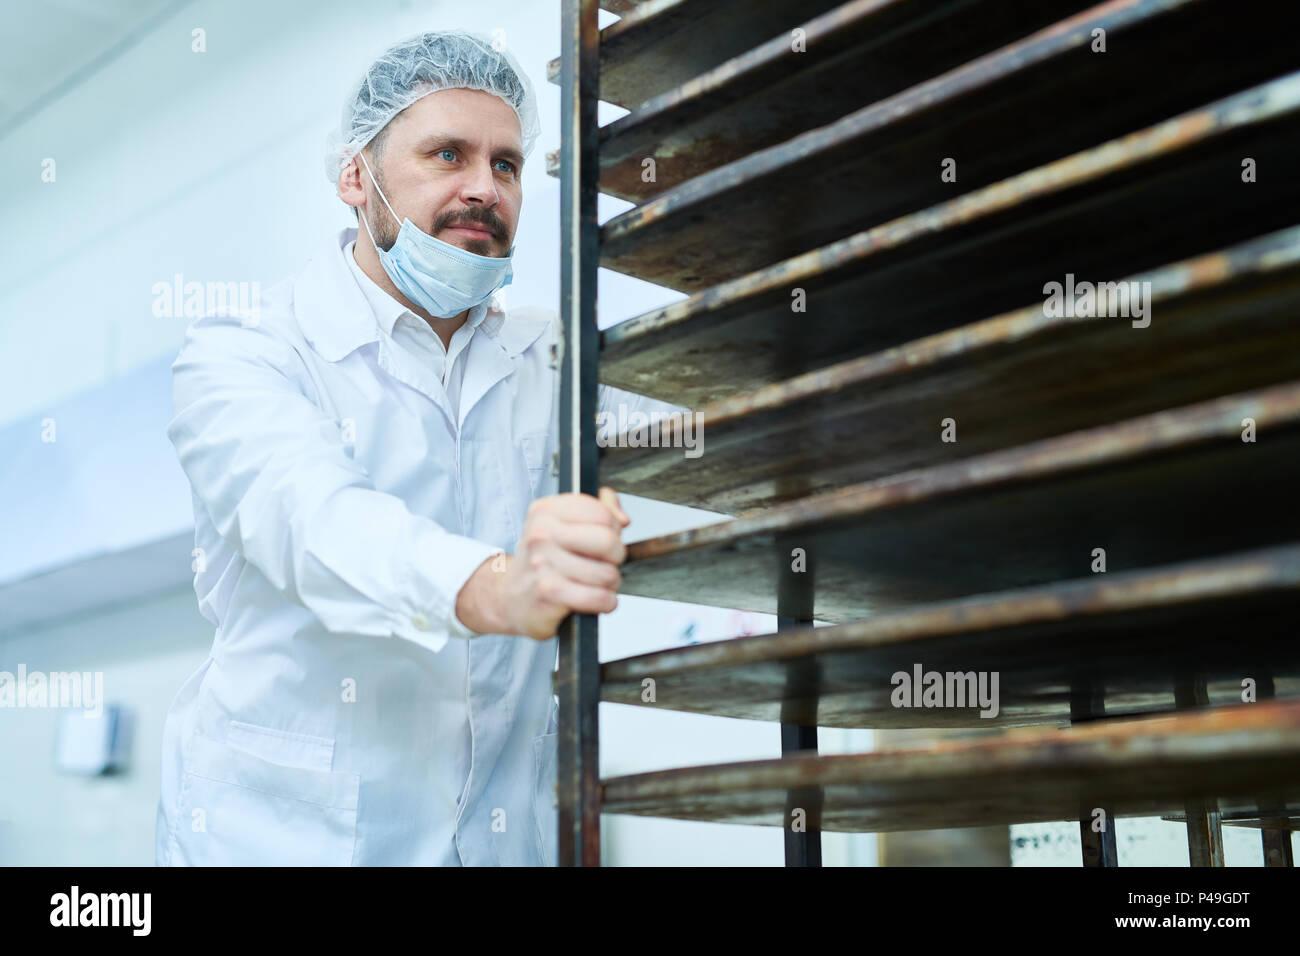 Man in white uniform moving shelves for bread - Stock Image